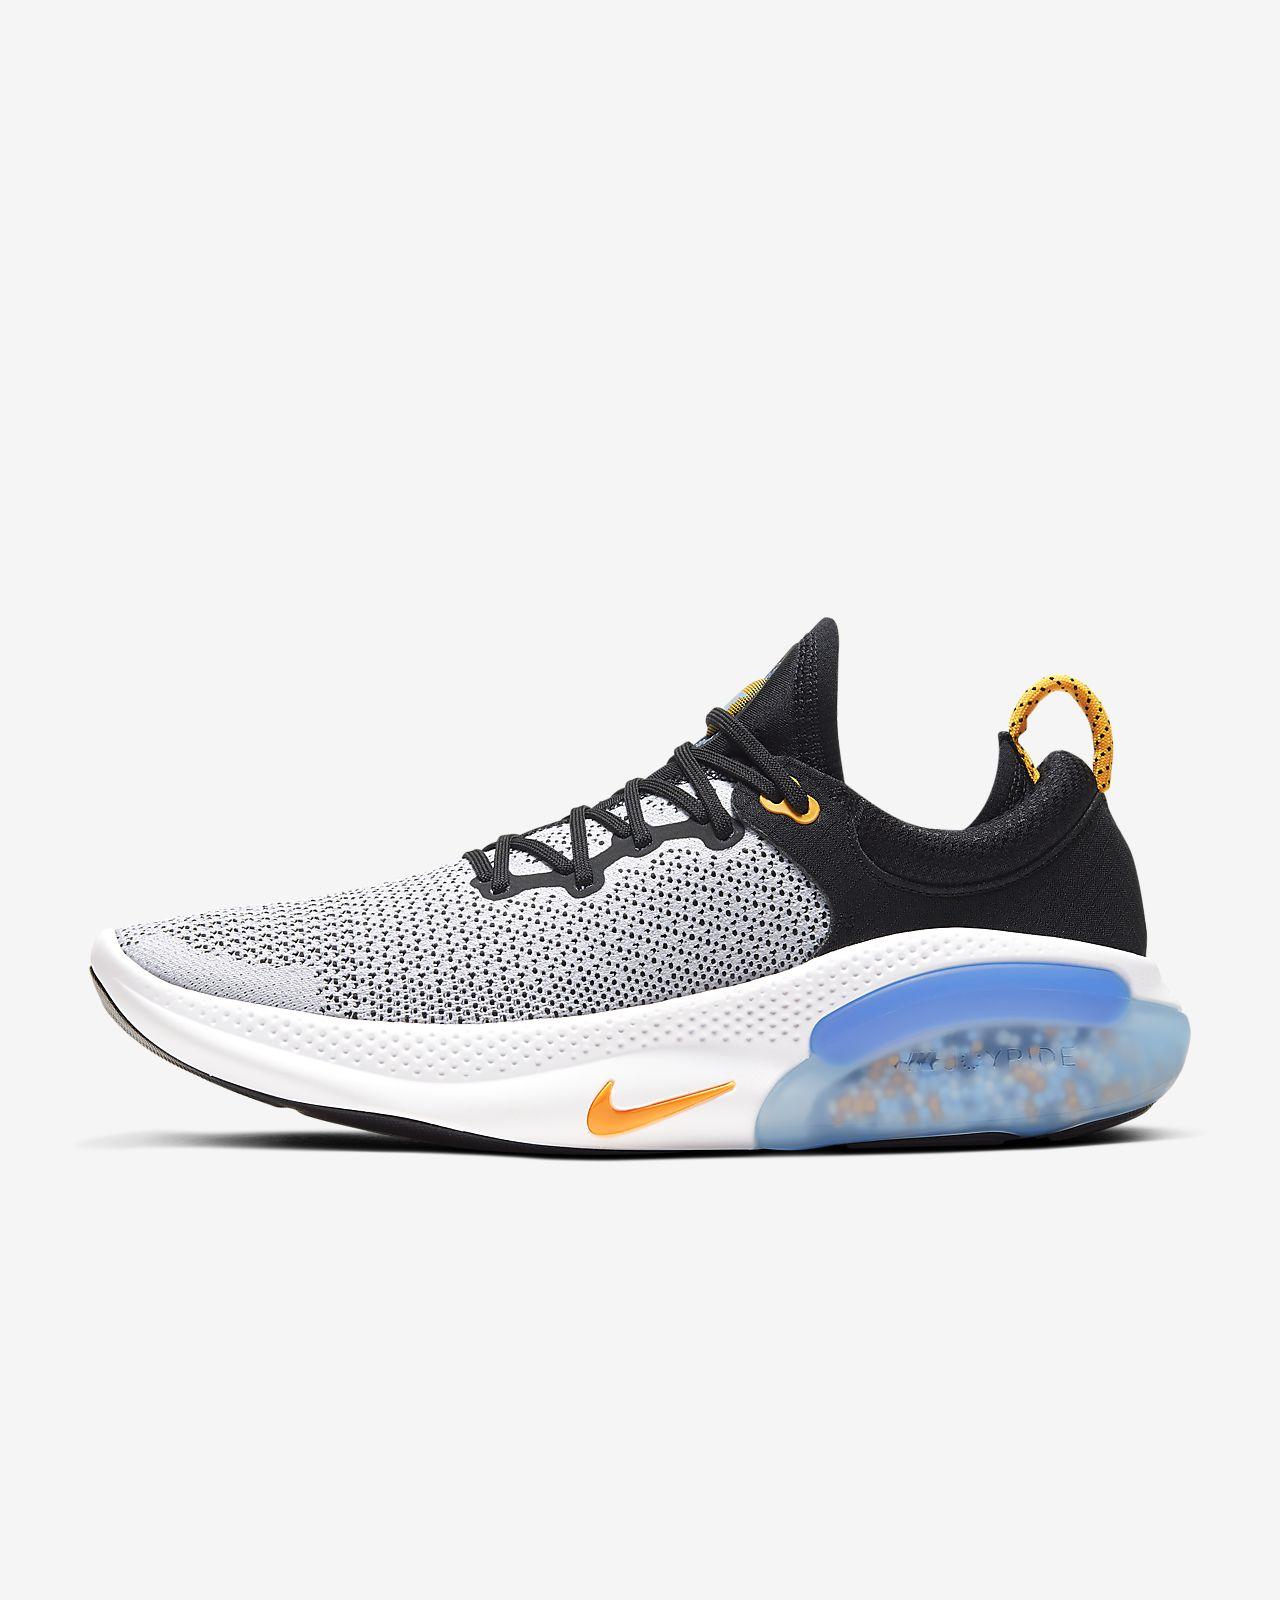 Nike Joyride Run Flyknit Men's Running Shoe